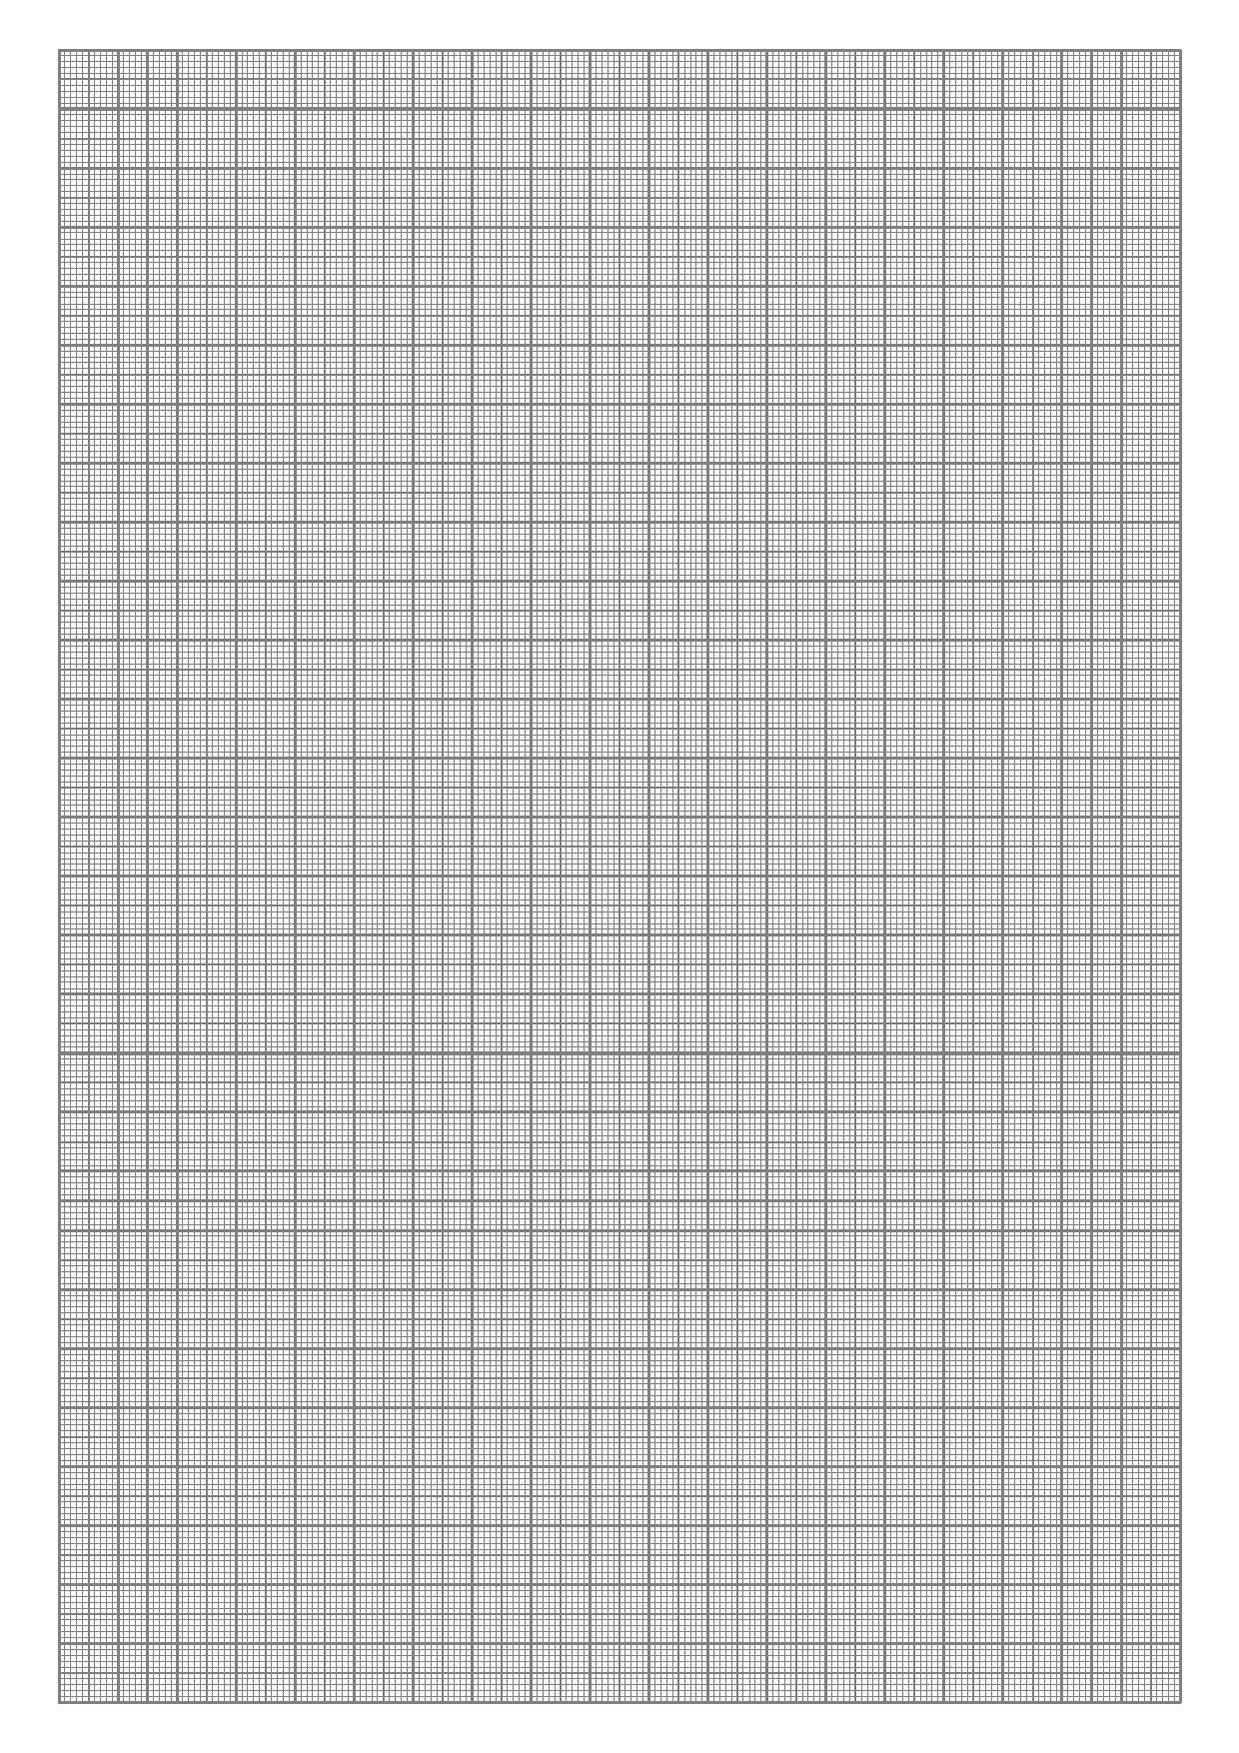 Pixel To Cm